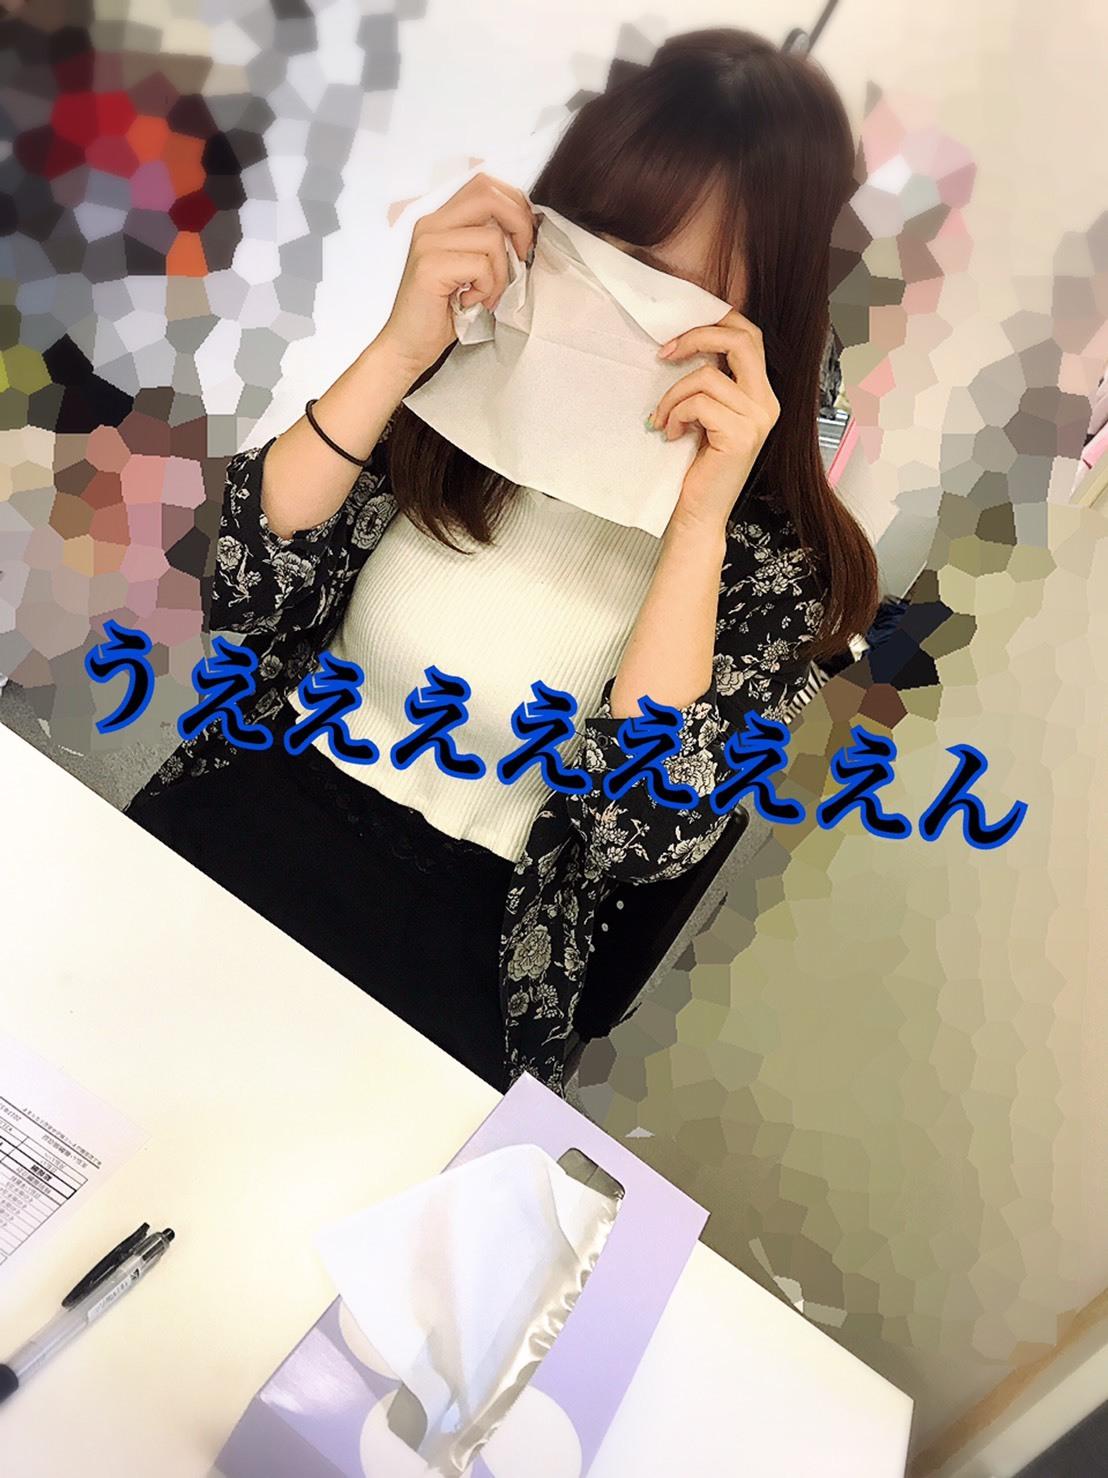 S__4628492.jpg